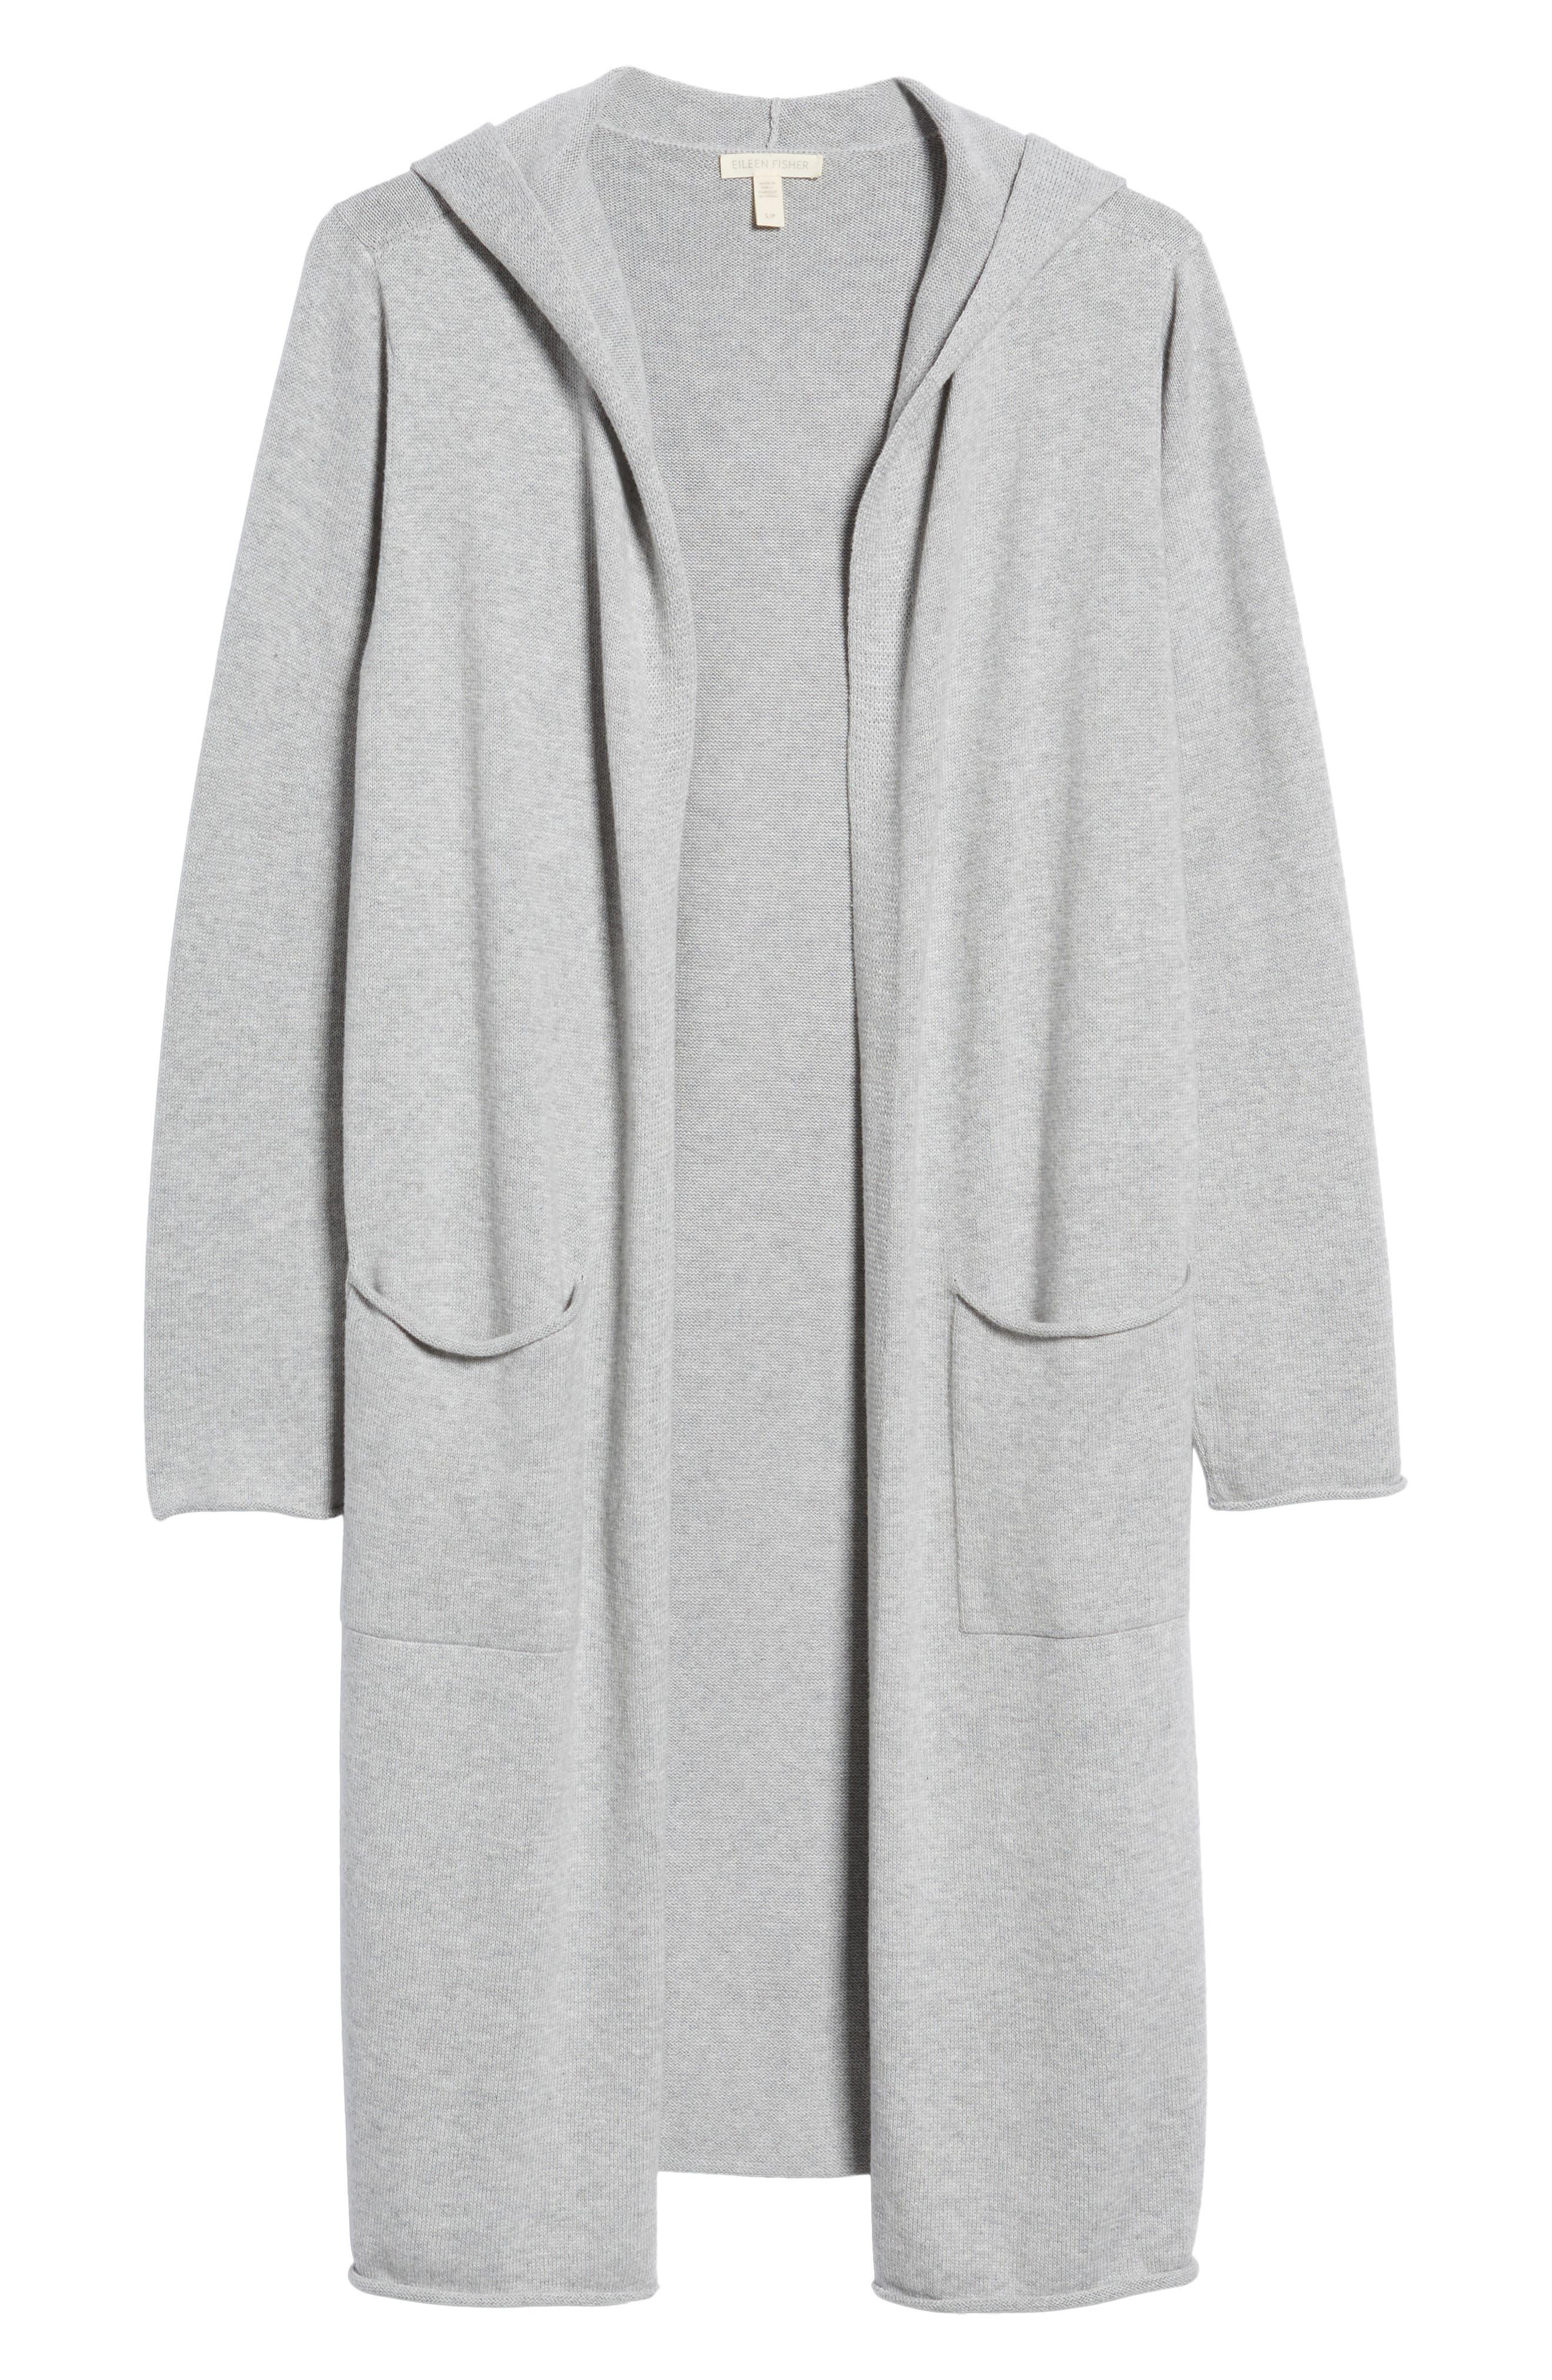 Organic Cotton Hooded Cardigan,                             Alternate thumbnail 6, color,                             022